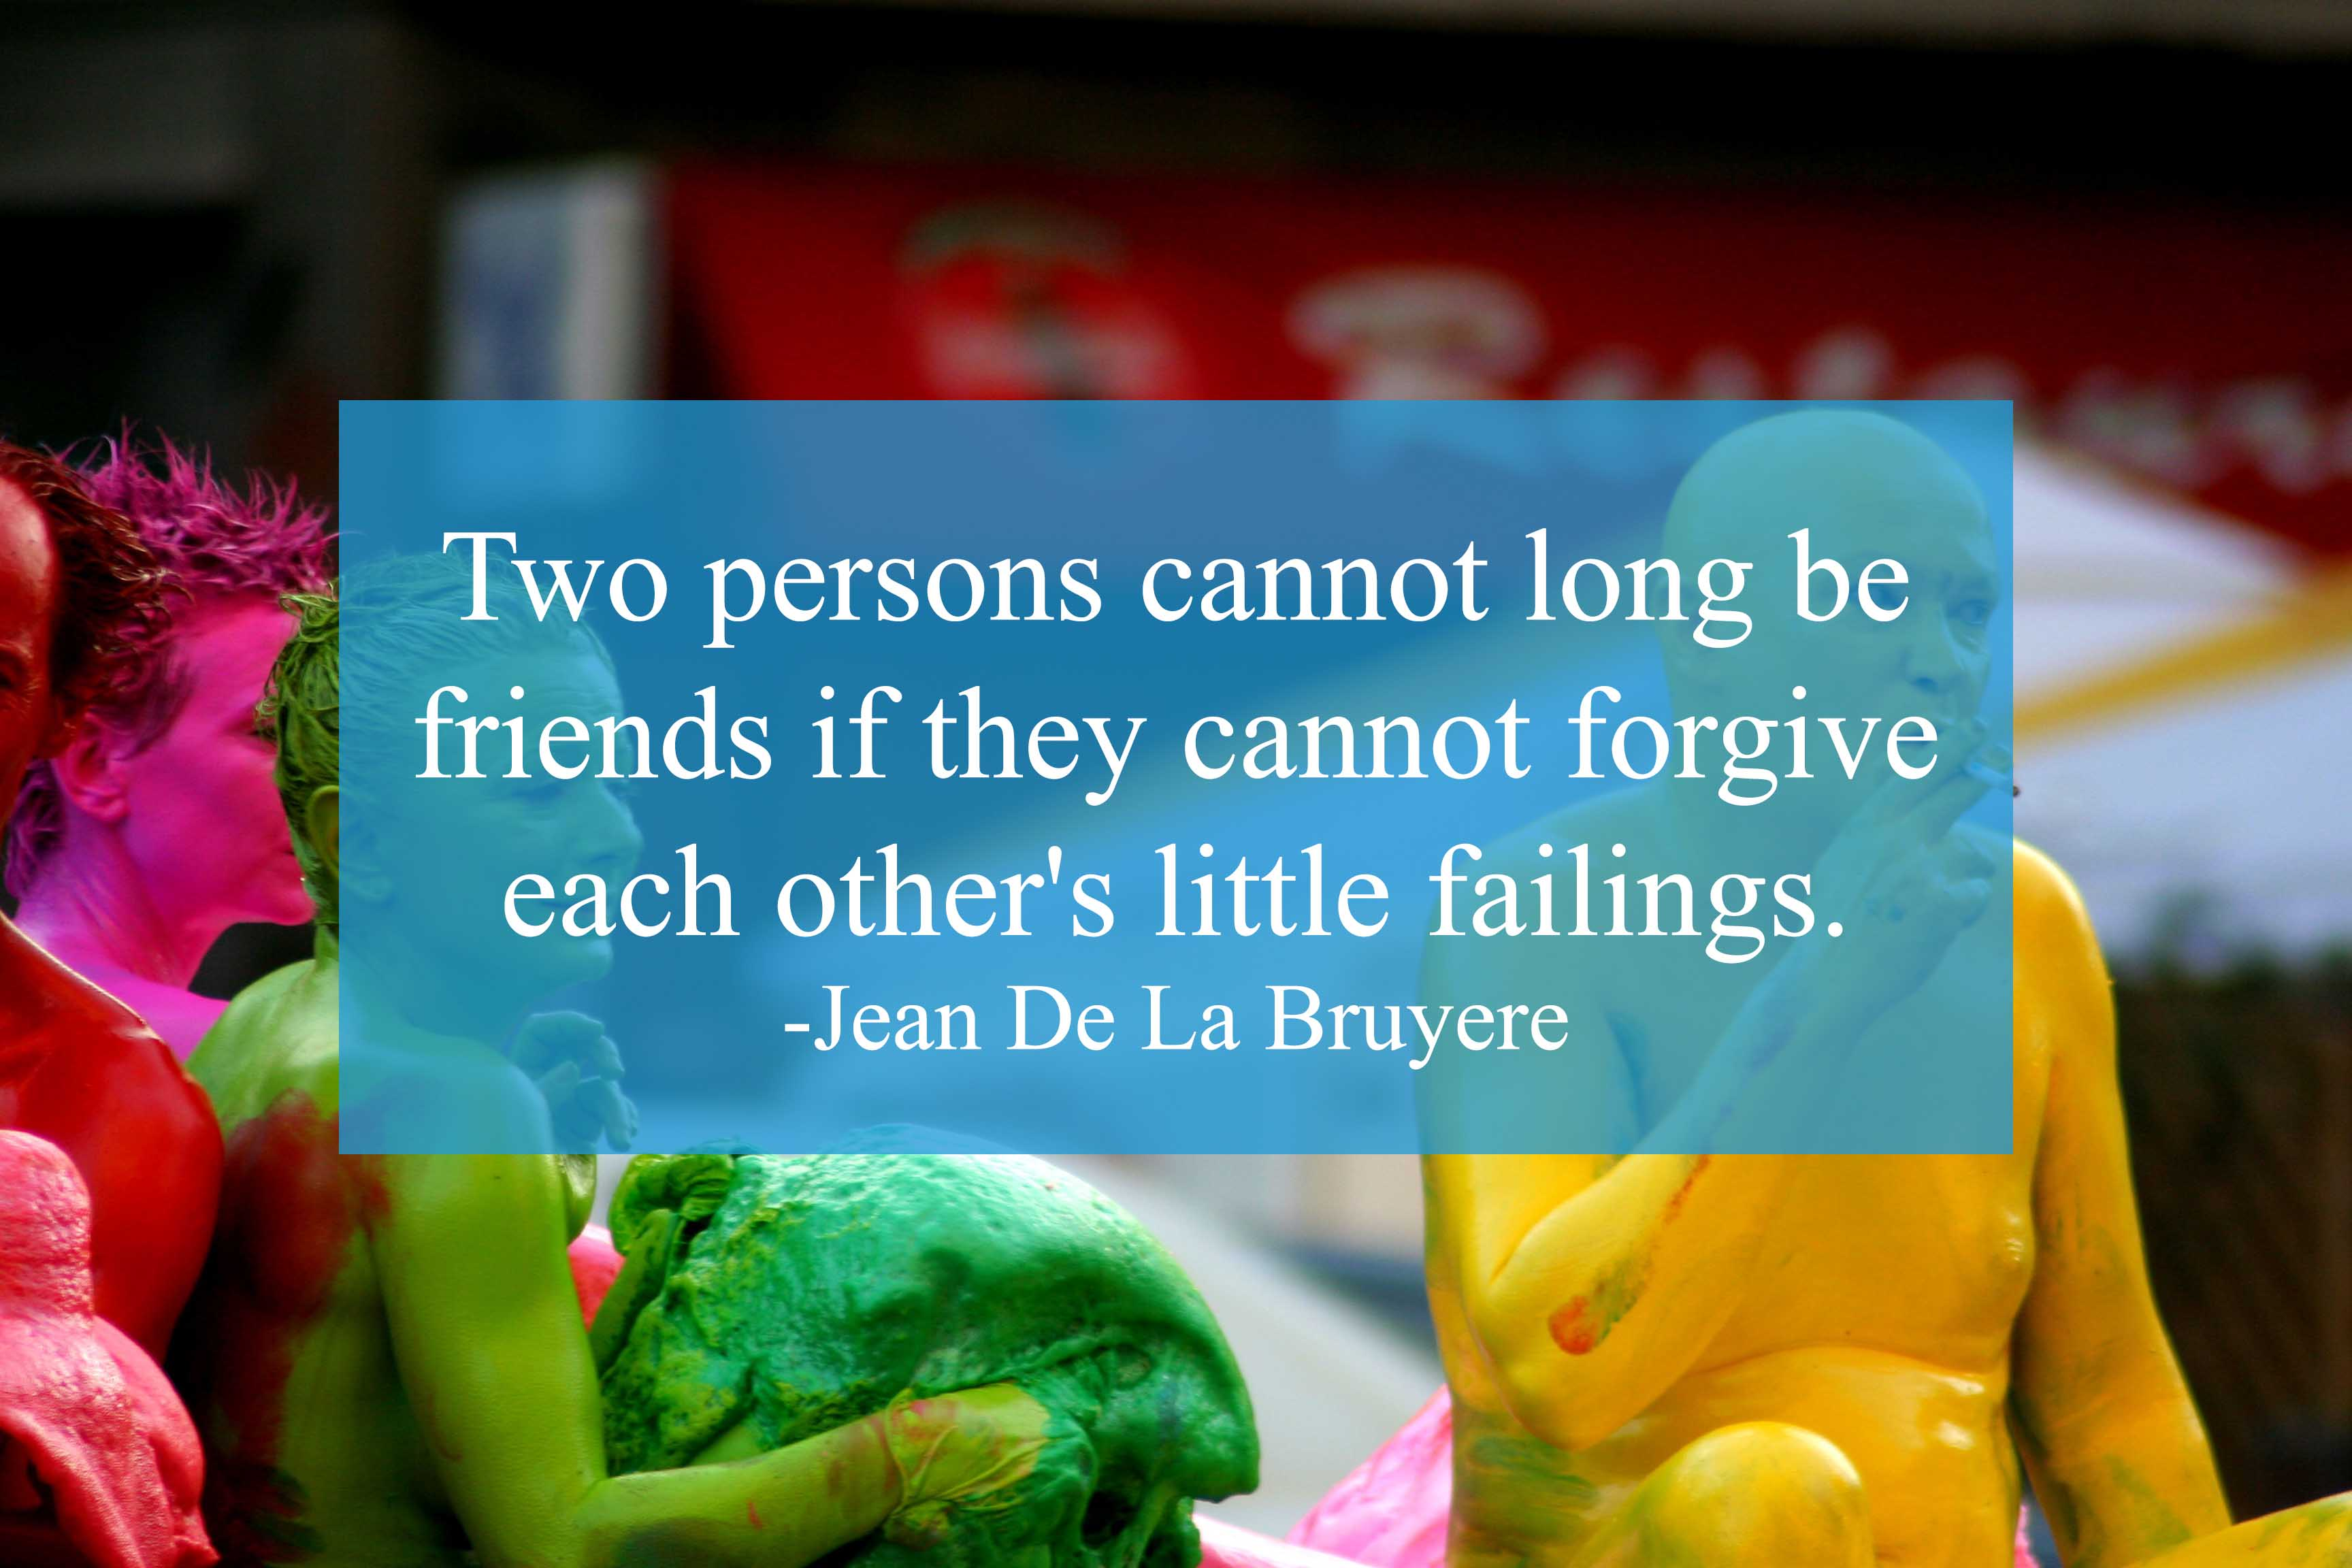 Jean de la Bruyre friendship quotes